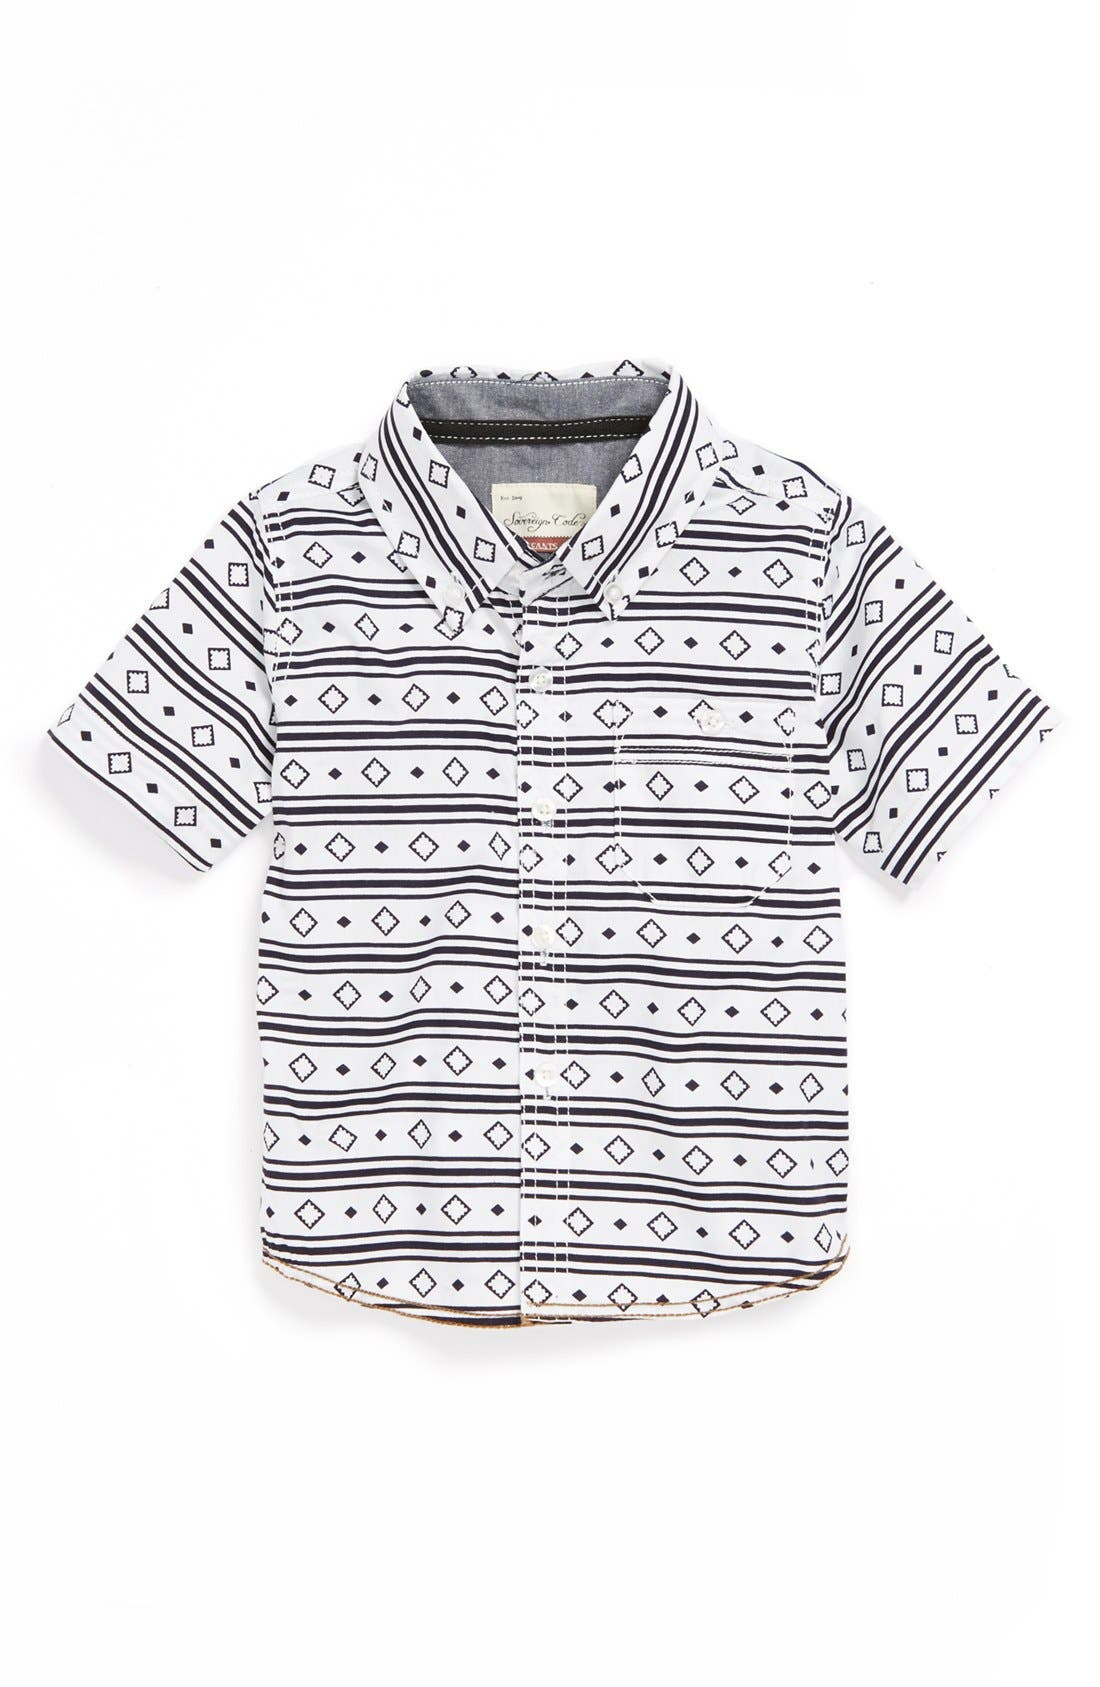 Alternate Image 1 Selected - Sovereign Code Woven Shirt (Toddler Boys)